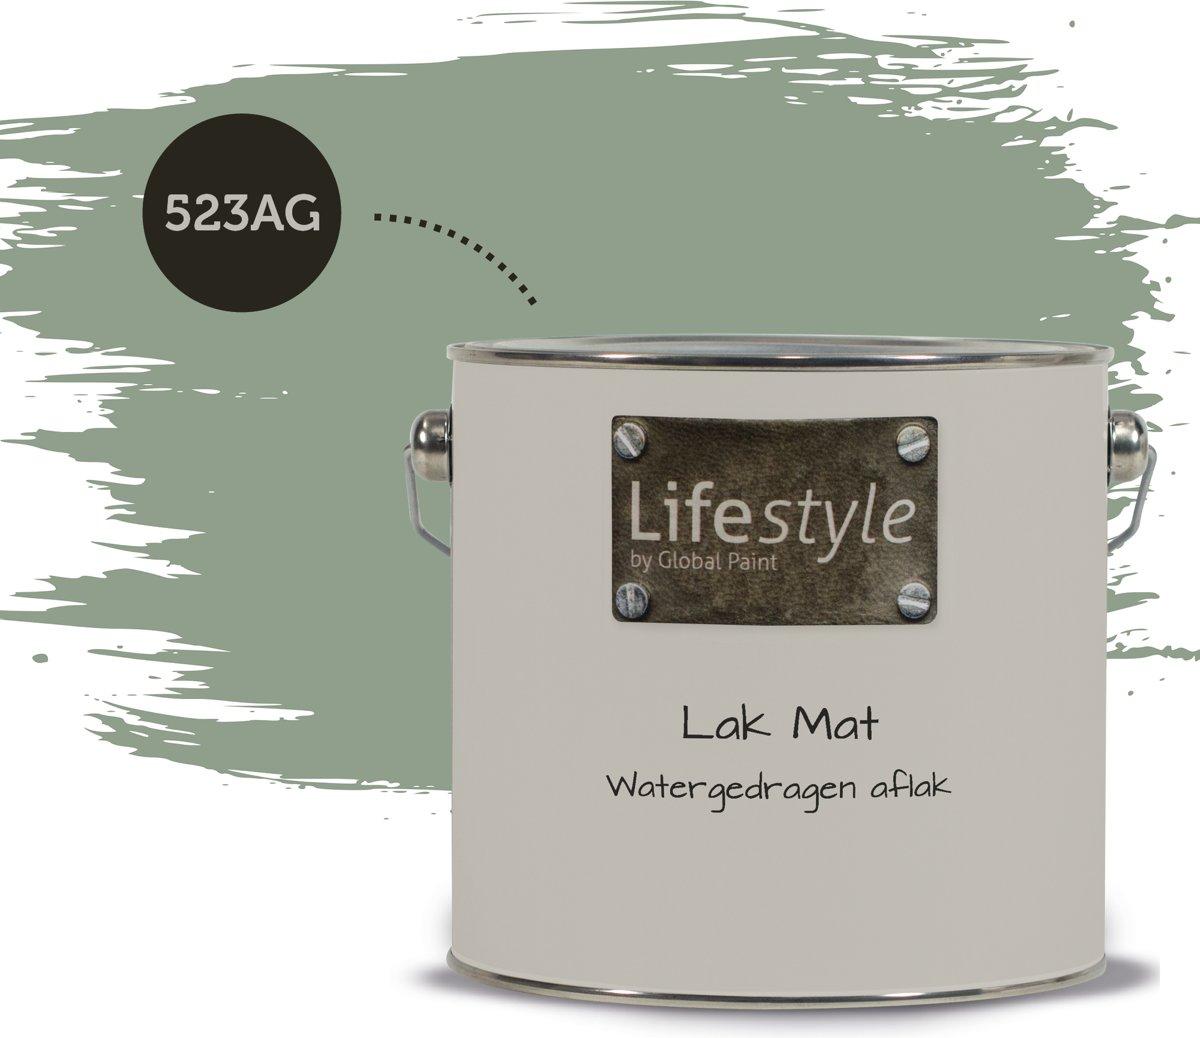 Lifestyle Lak Mat | 523AG | 2.5 liter